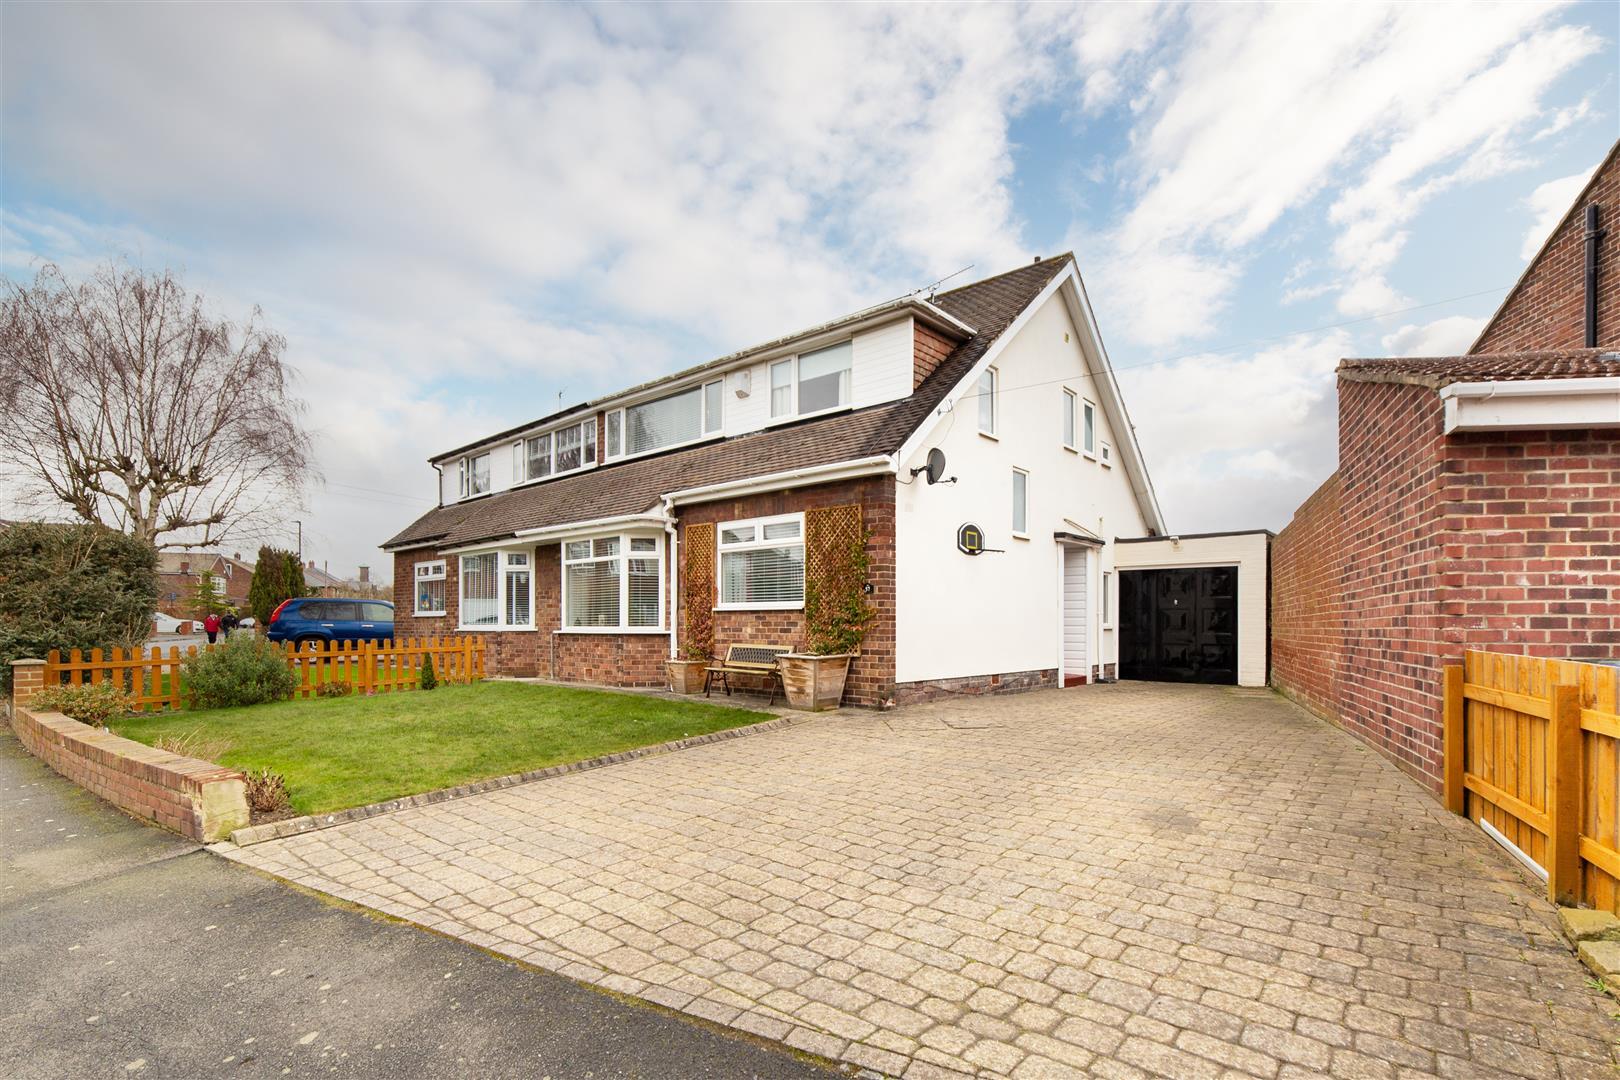 4 bed semi-detached house for sale in Brunton Park, NE3 5AN, NE3